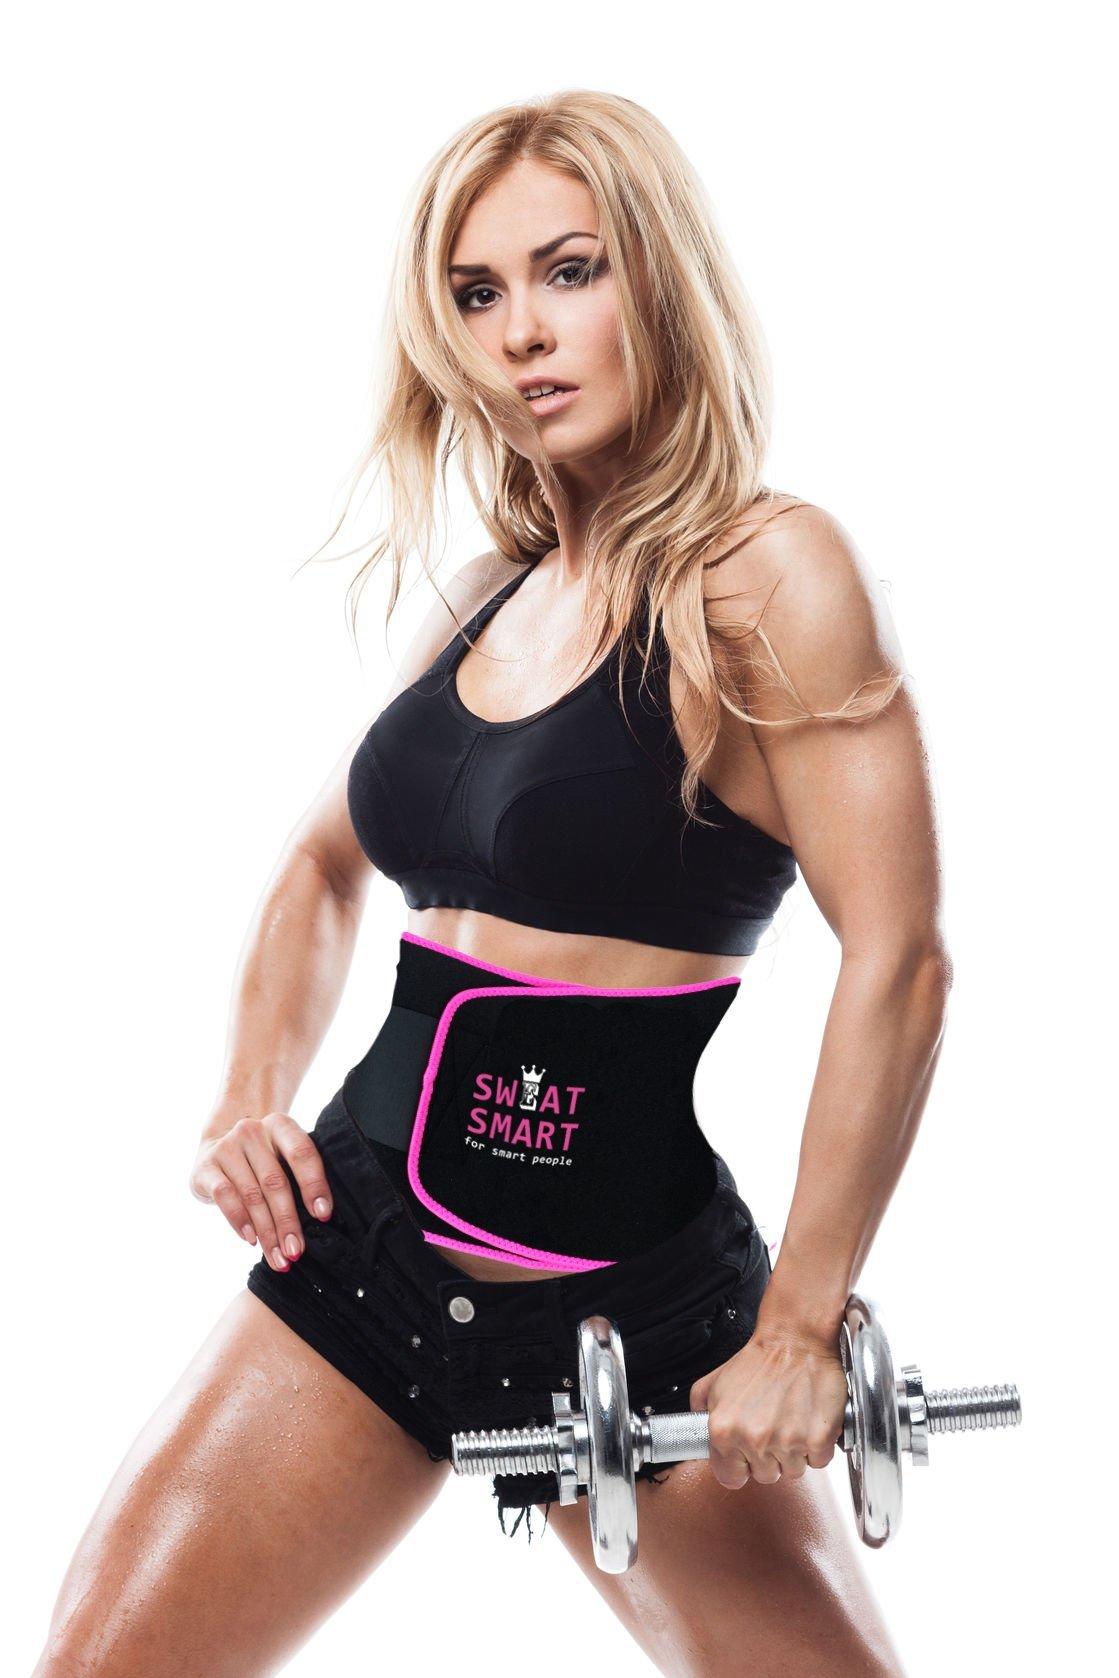 Sweat Smart Fitness Neoprene Waist Trimmer Reformer Athletics Shapewear Lose Belly Fat Burner Slim Body Wrap Weight Loss Fast - Pink(Small: 8'' Width x 35'' Length)